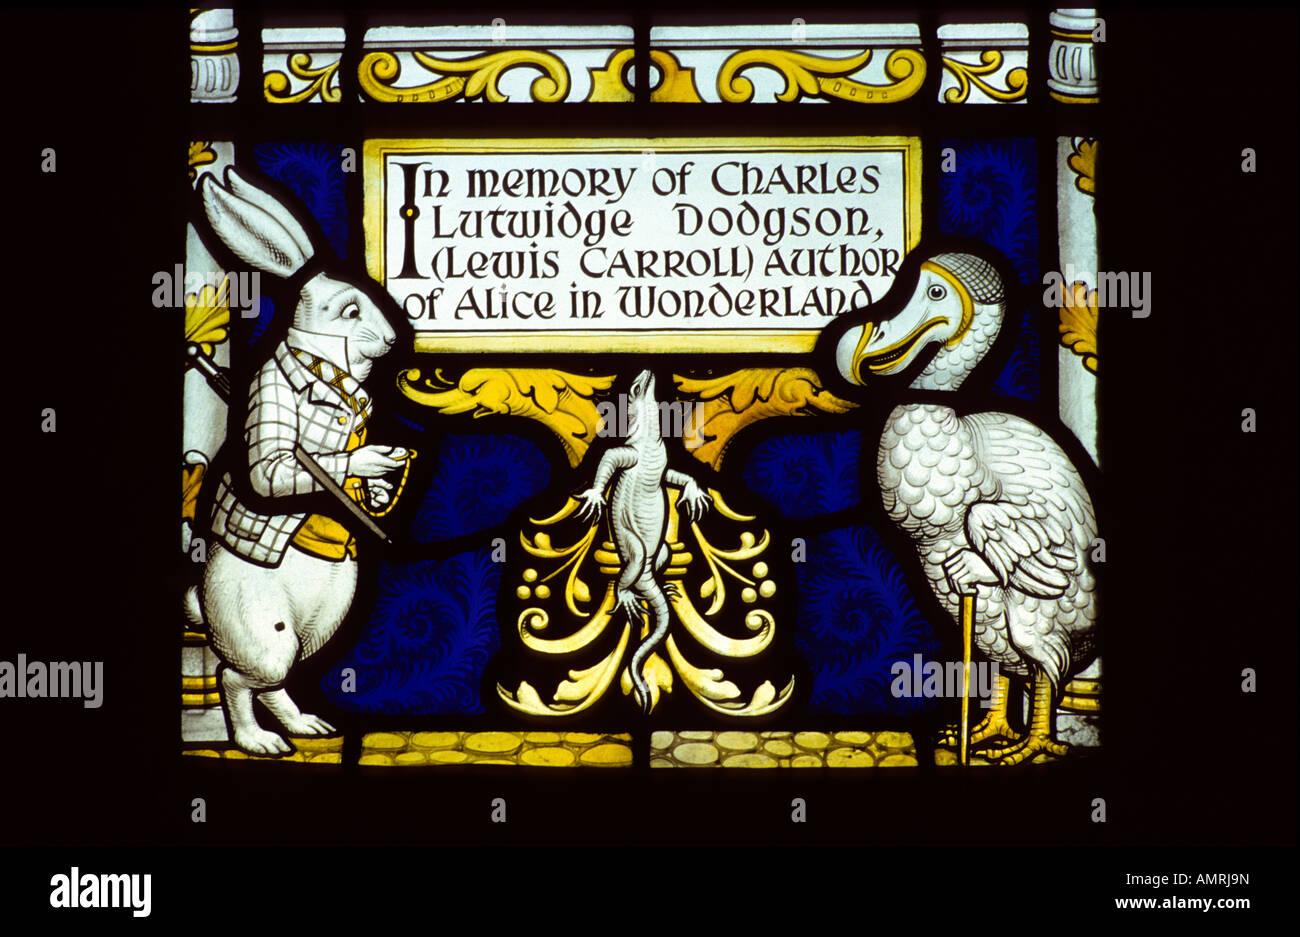 Lewis Carroll stained glass memorial window #1, Daresbury church, Cheshire, UK. - Stock Image